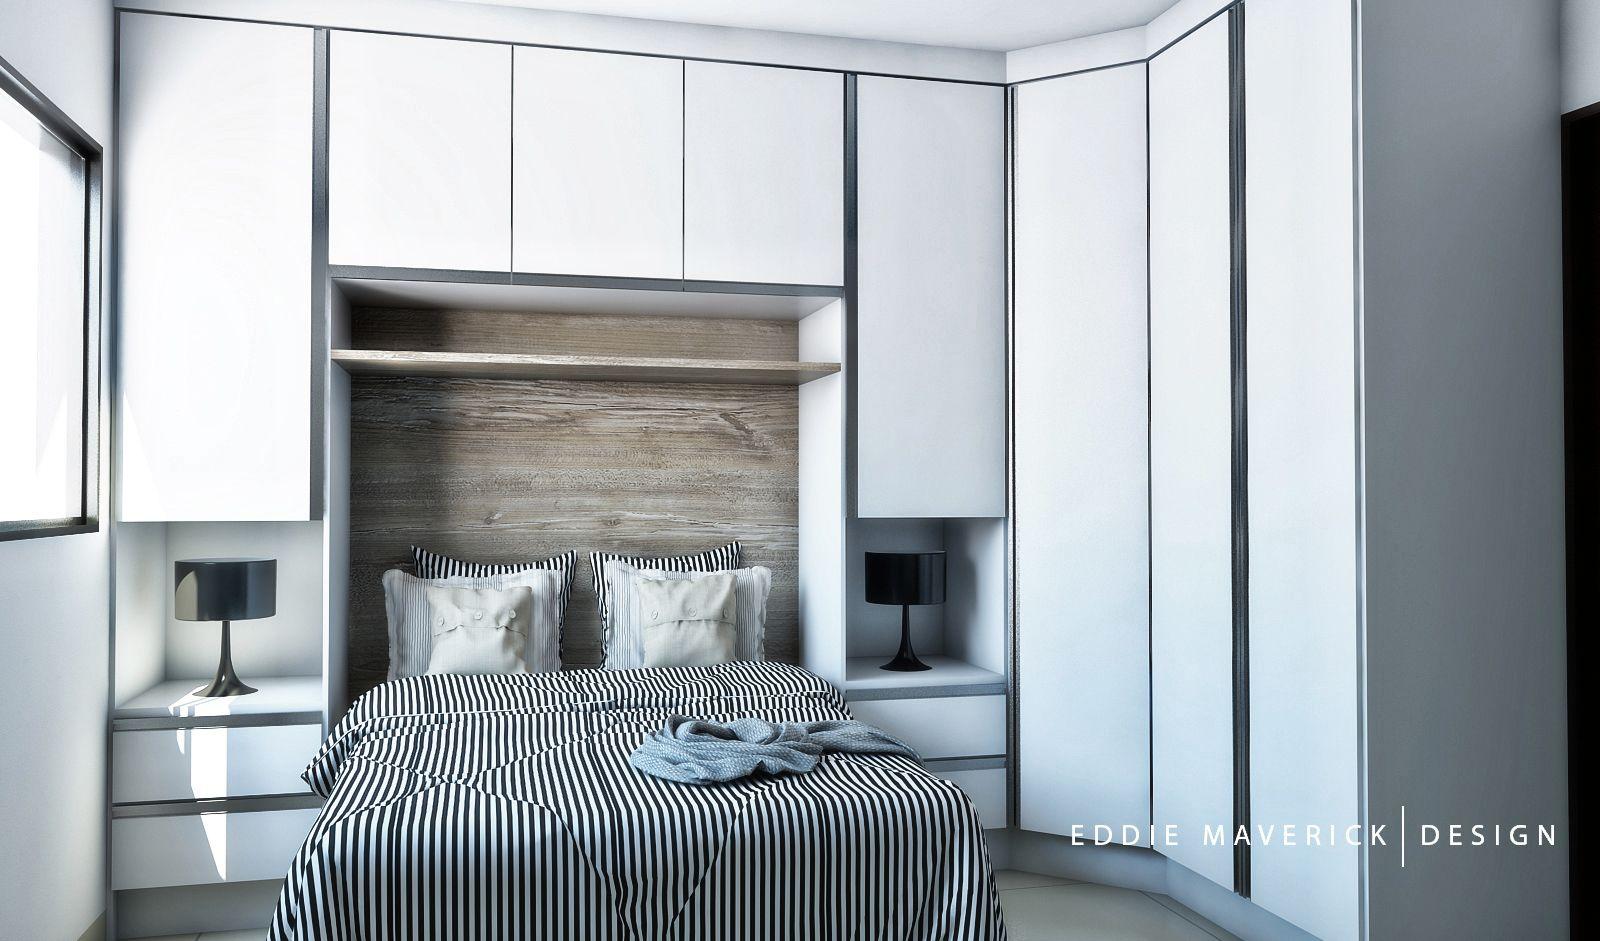 Guarda Roupa com cama de casal embutida Planejados  ~ Quarto Casal Guarda Roupa